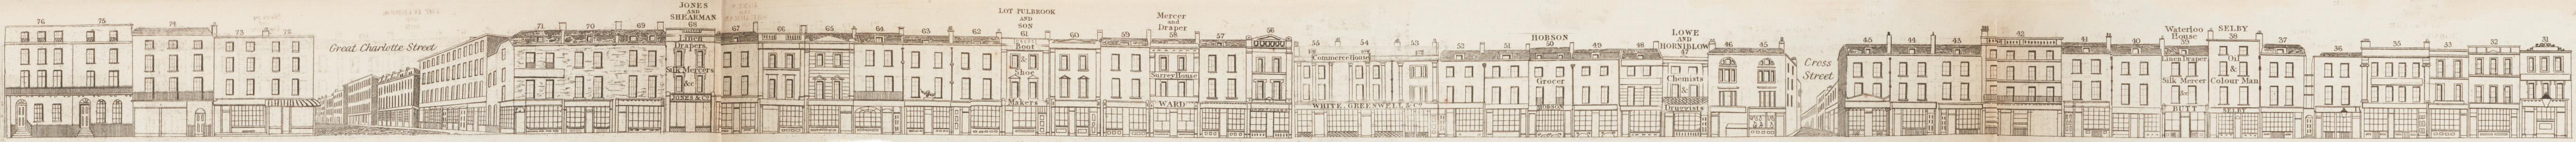 map - Tallis's London street views : No. 58. Blackfriars Road, division 2 (west)